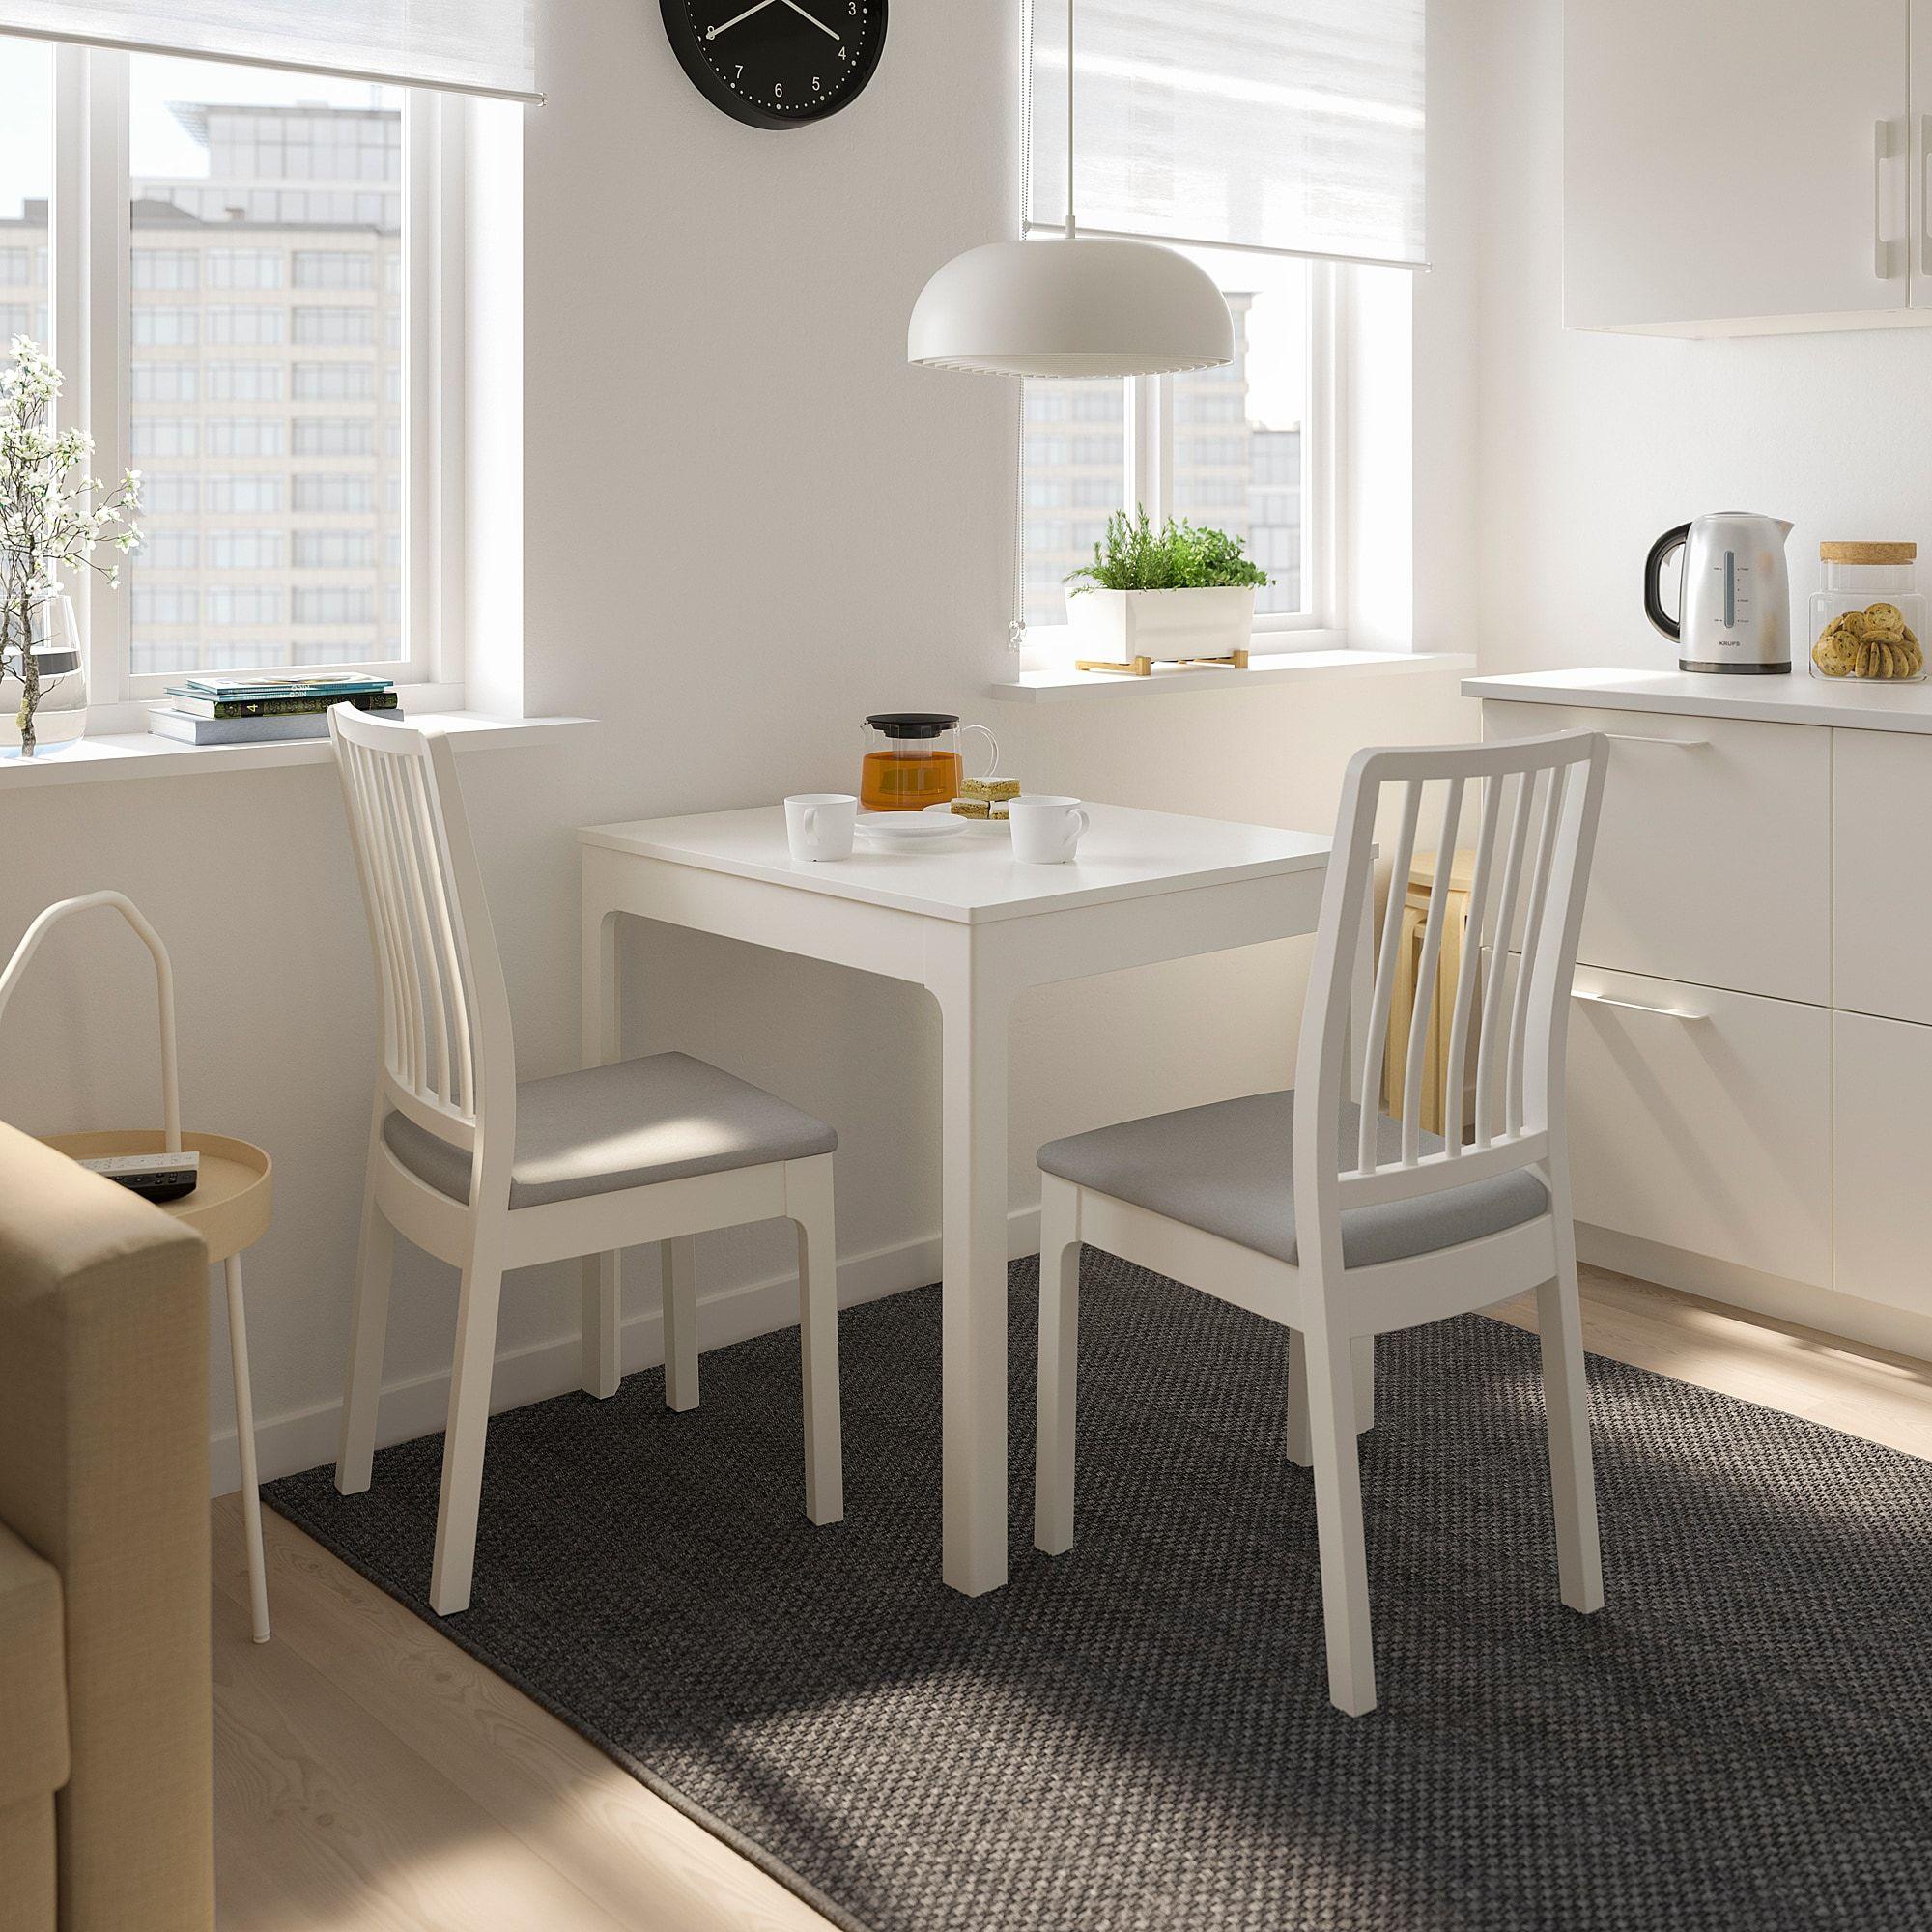 Ikea Ekedalen Extendable Table White Ikea Dining Ikea Dining